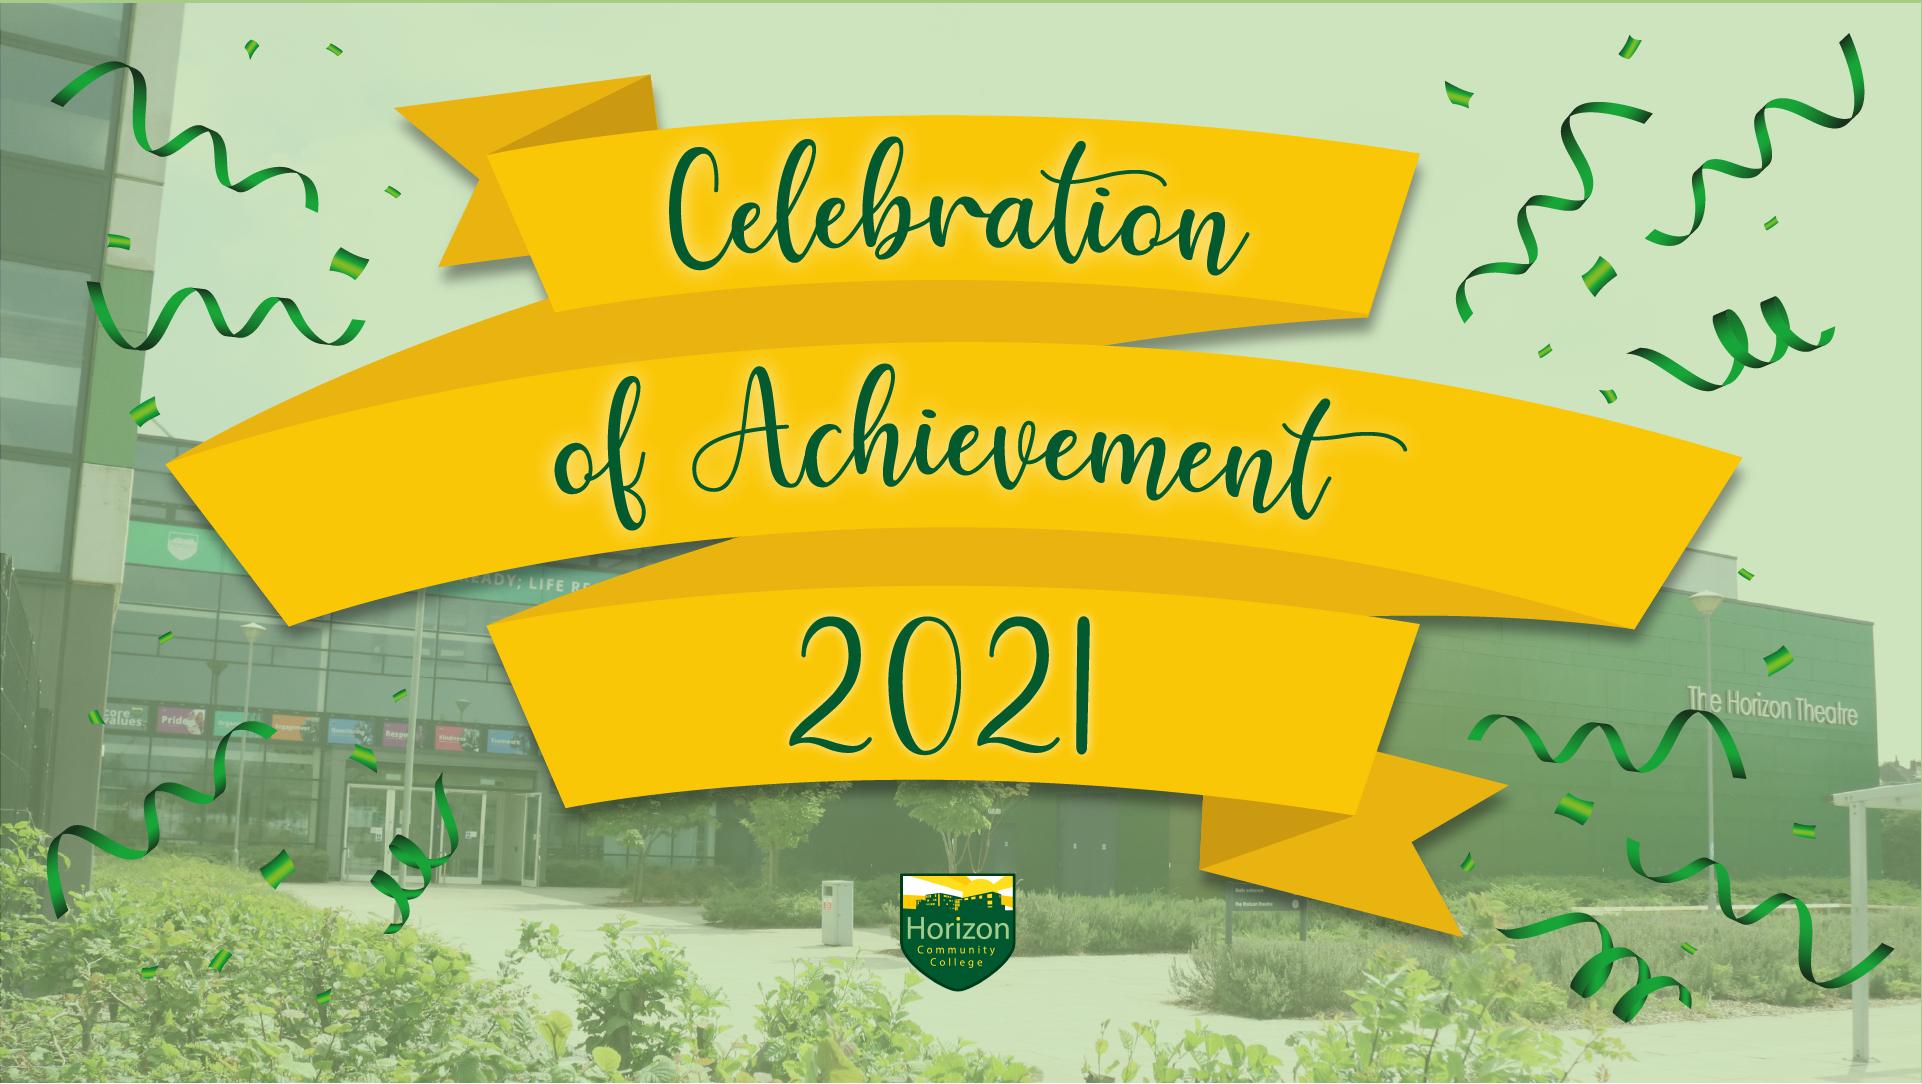 Celebration of Achievement 2021